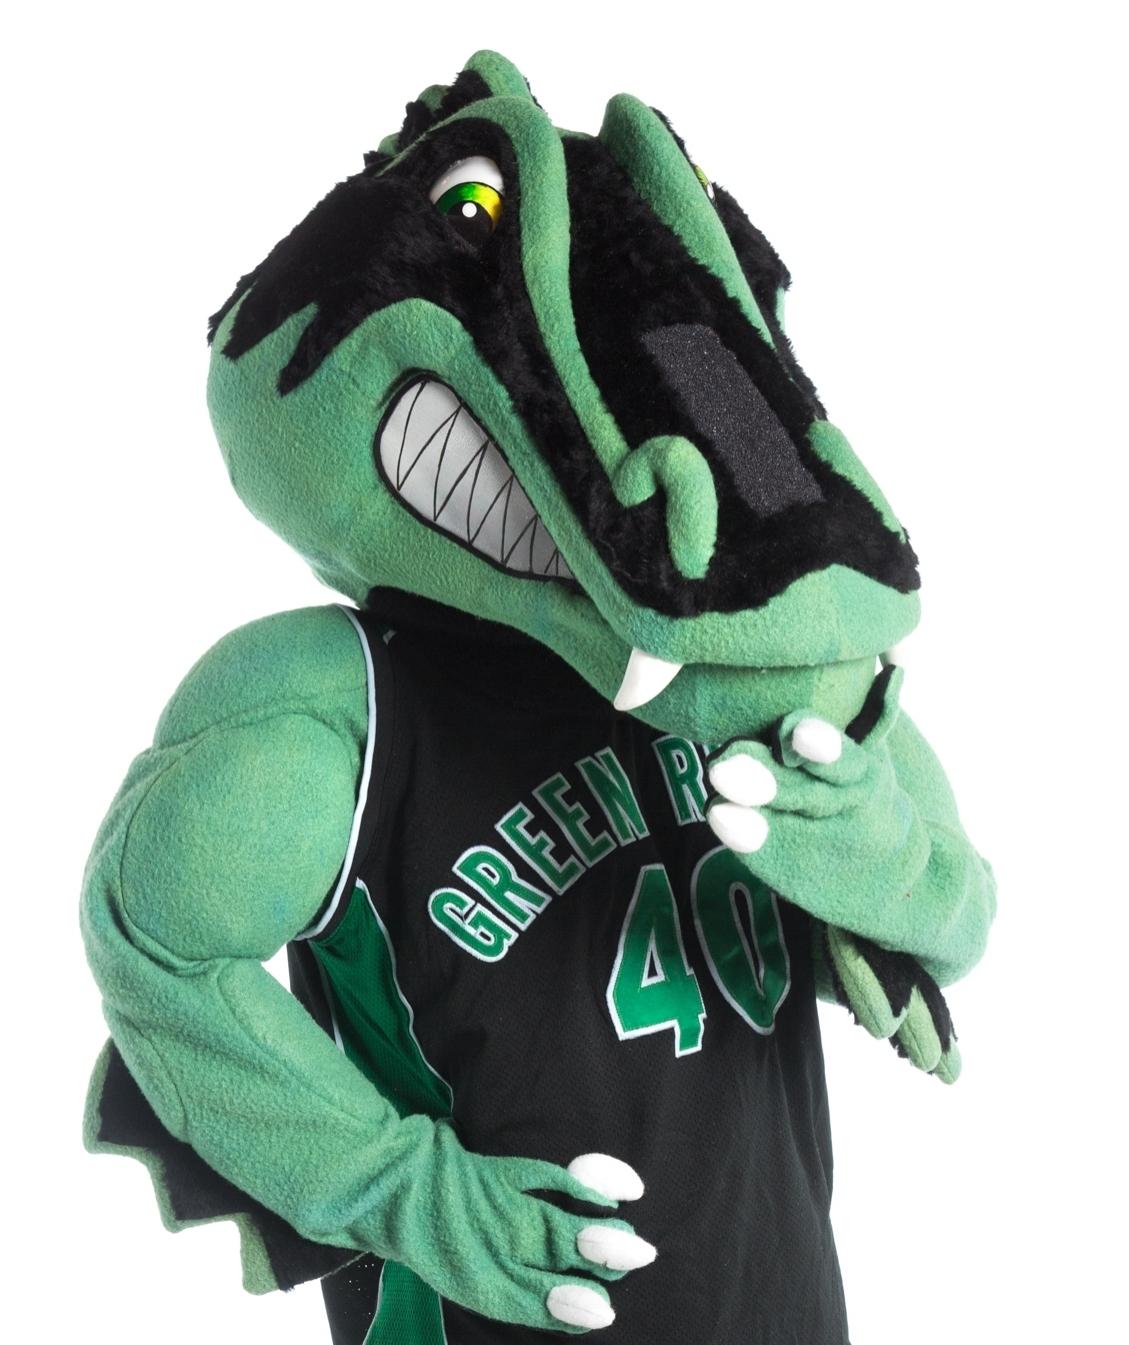 Slater - Green River College